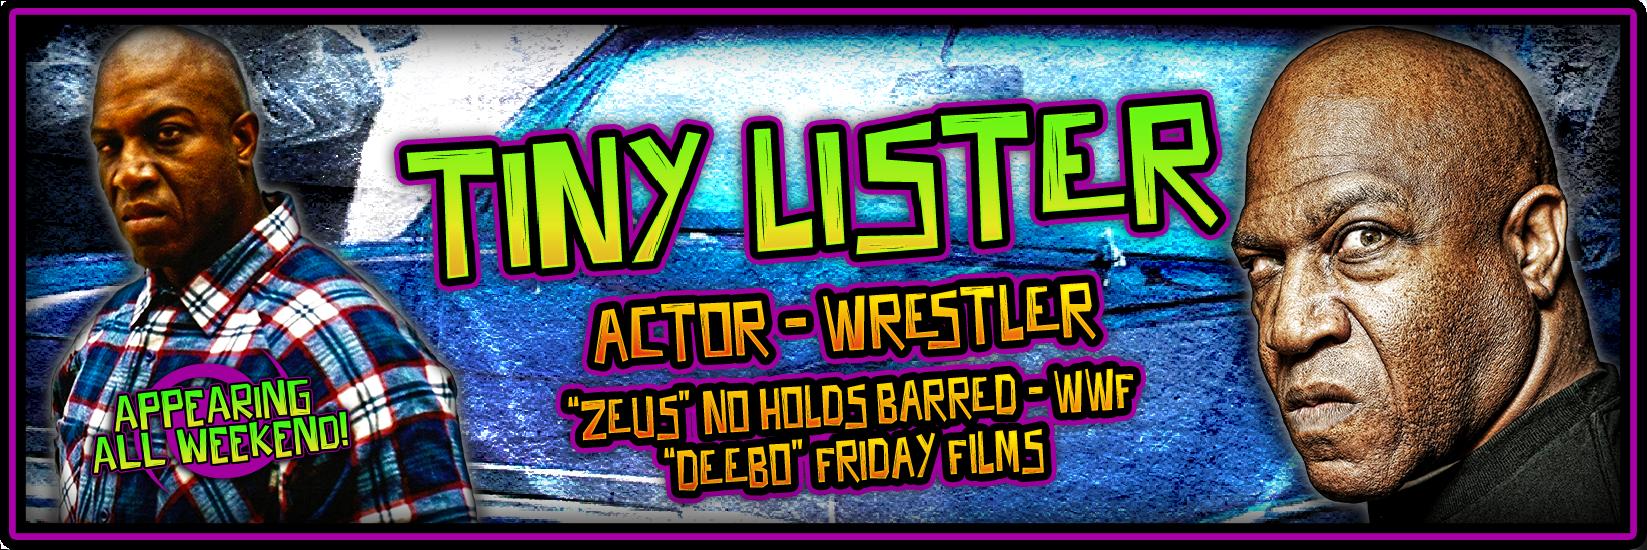 Tiny-Lister-Website-Banner.png